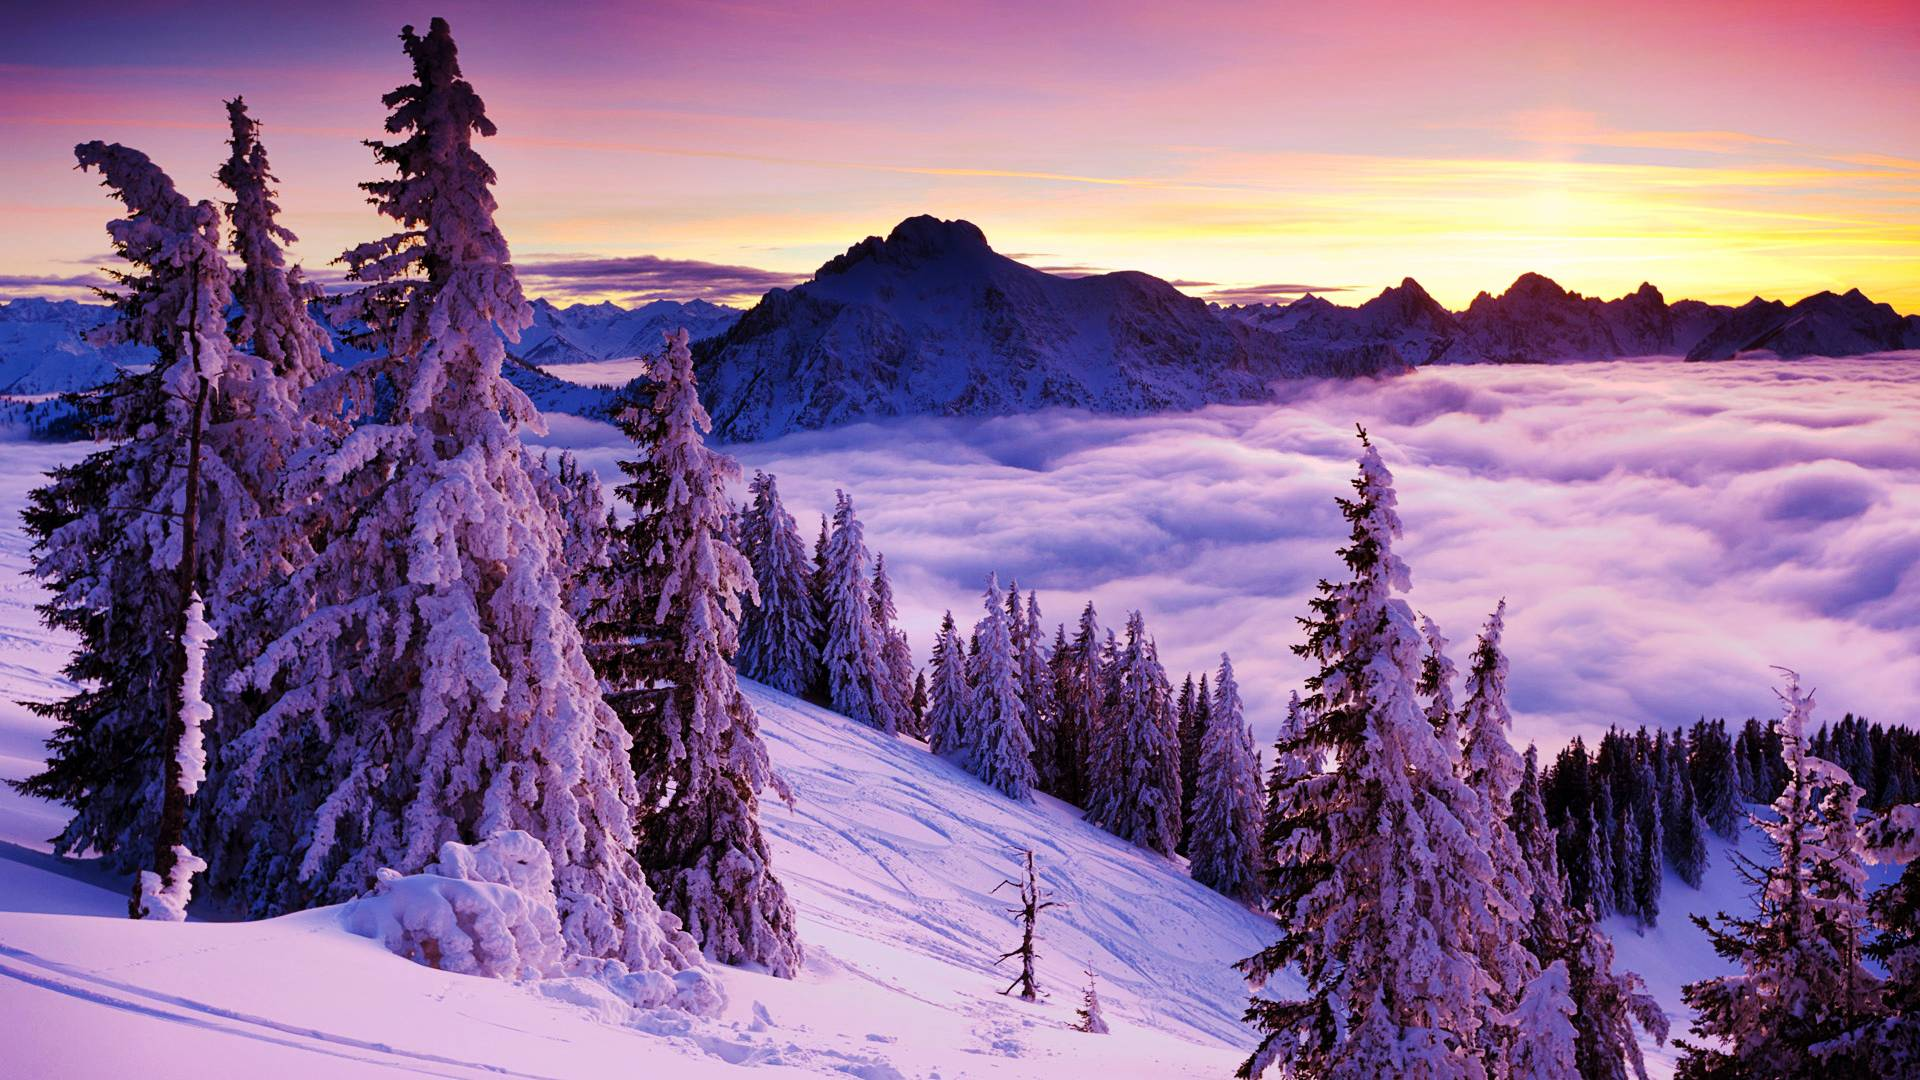 scenic winter beautiful wallpapers -#main